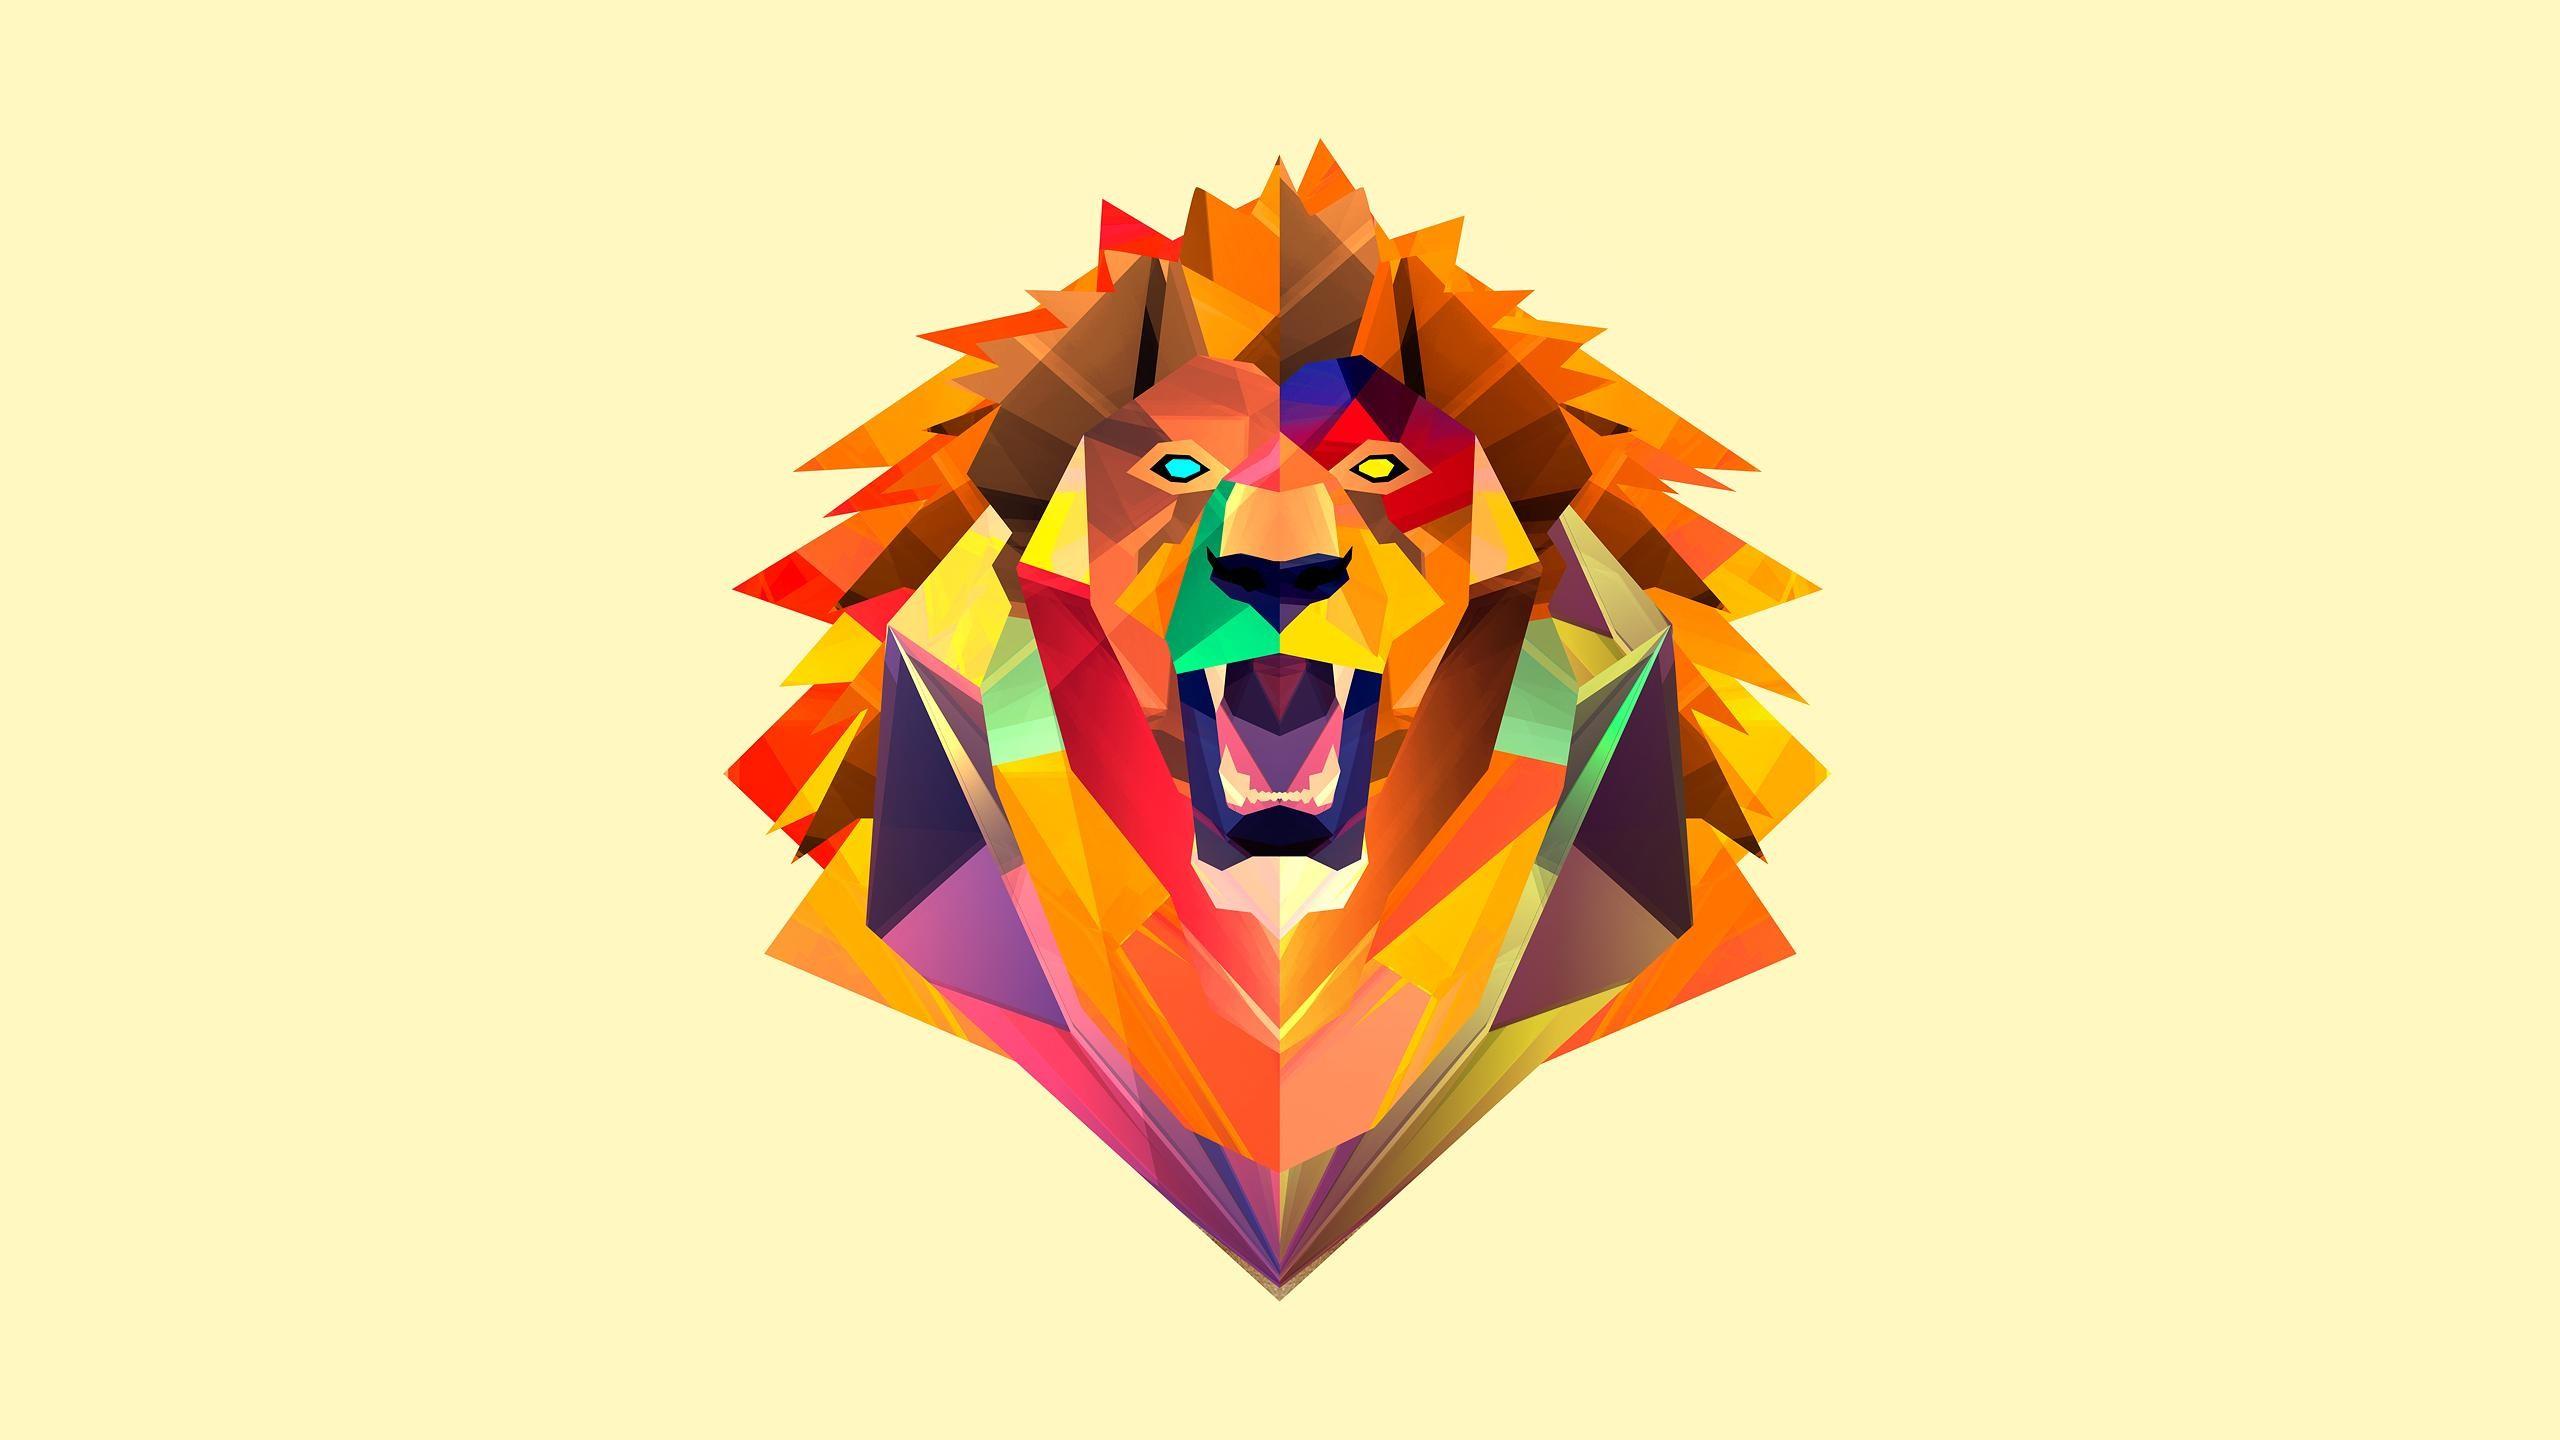 designhumans iphone 6 plus wallpaper. hipster lions | tumblr